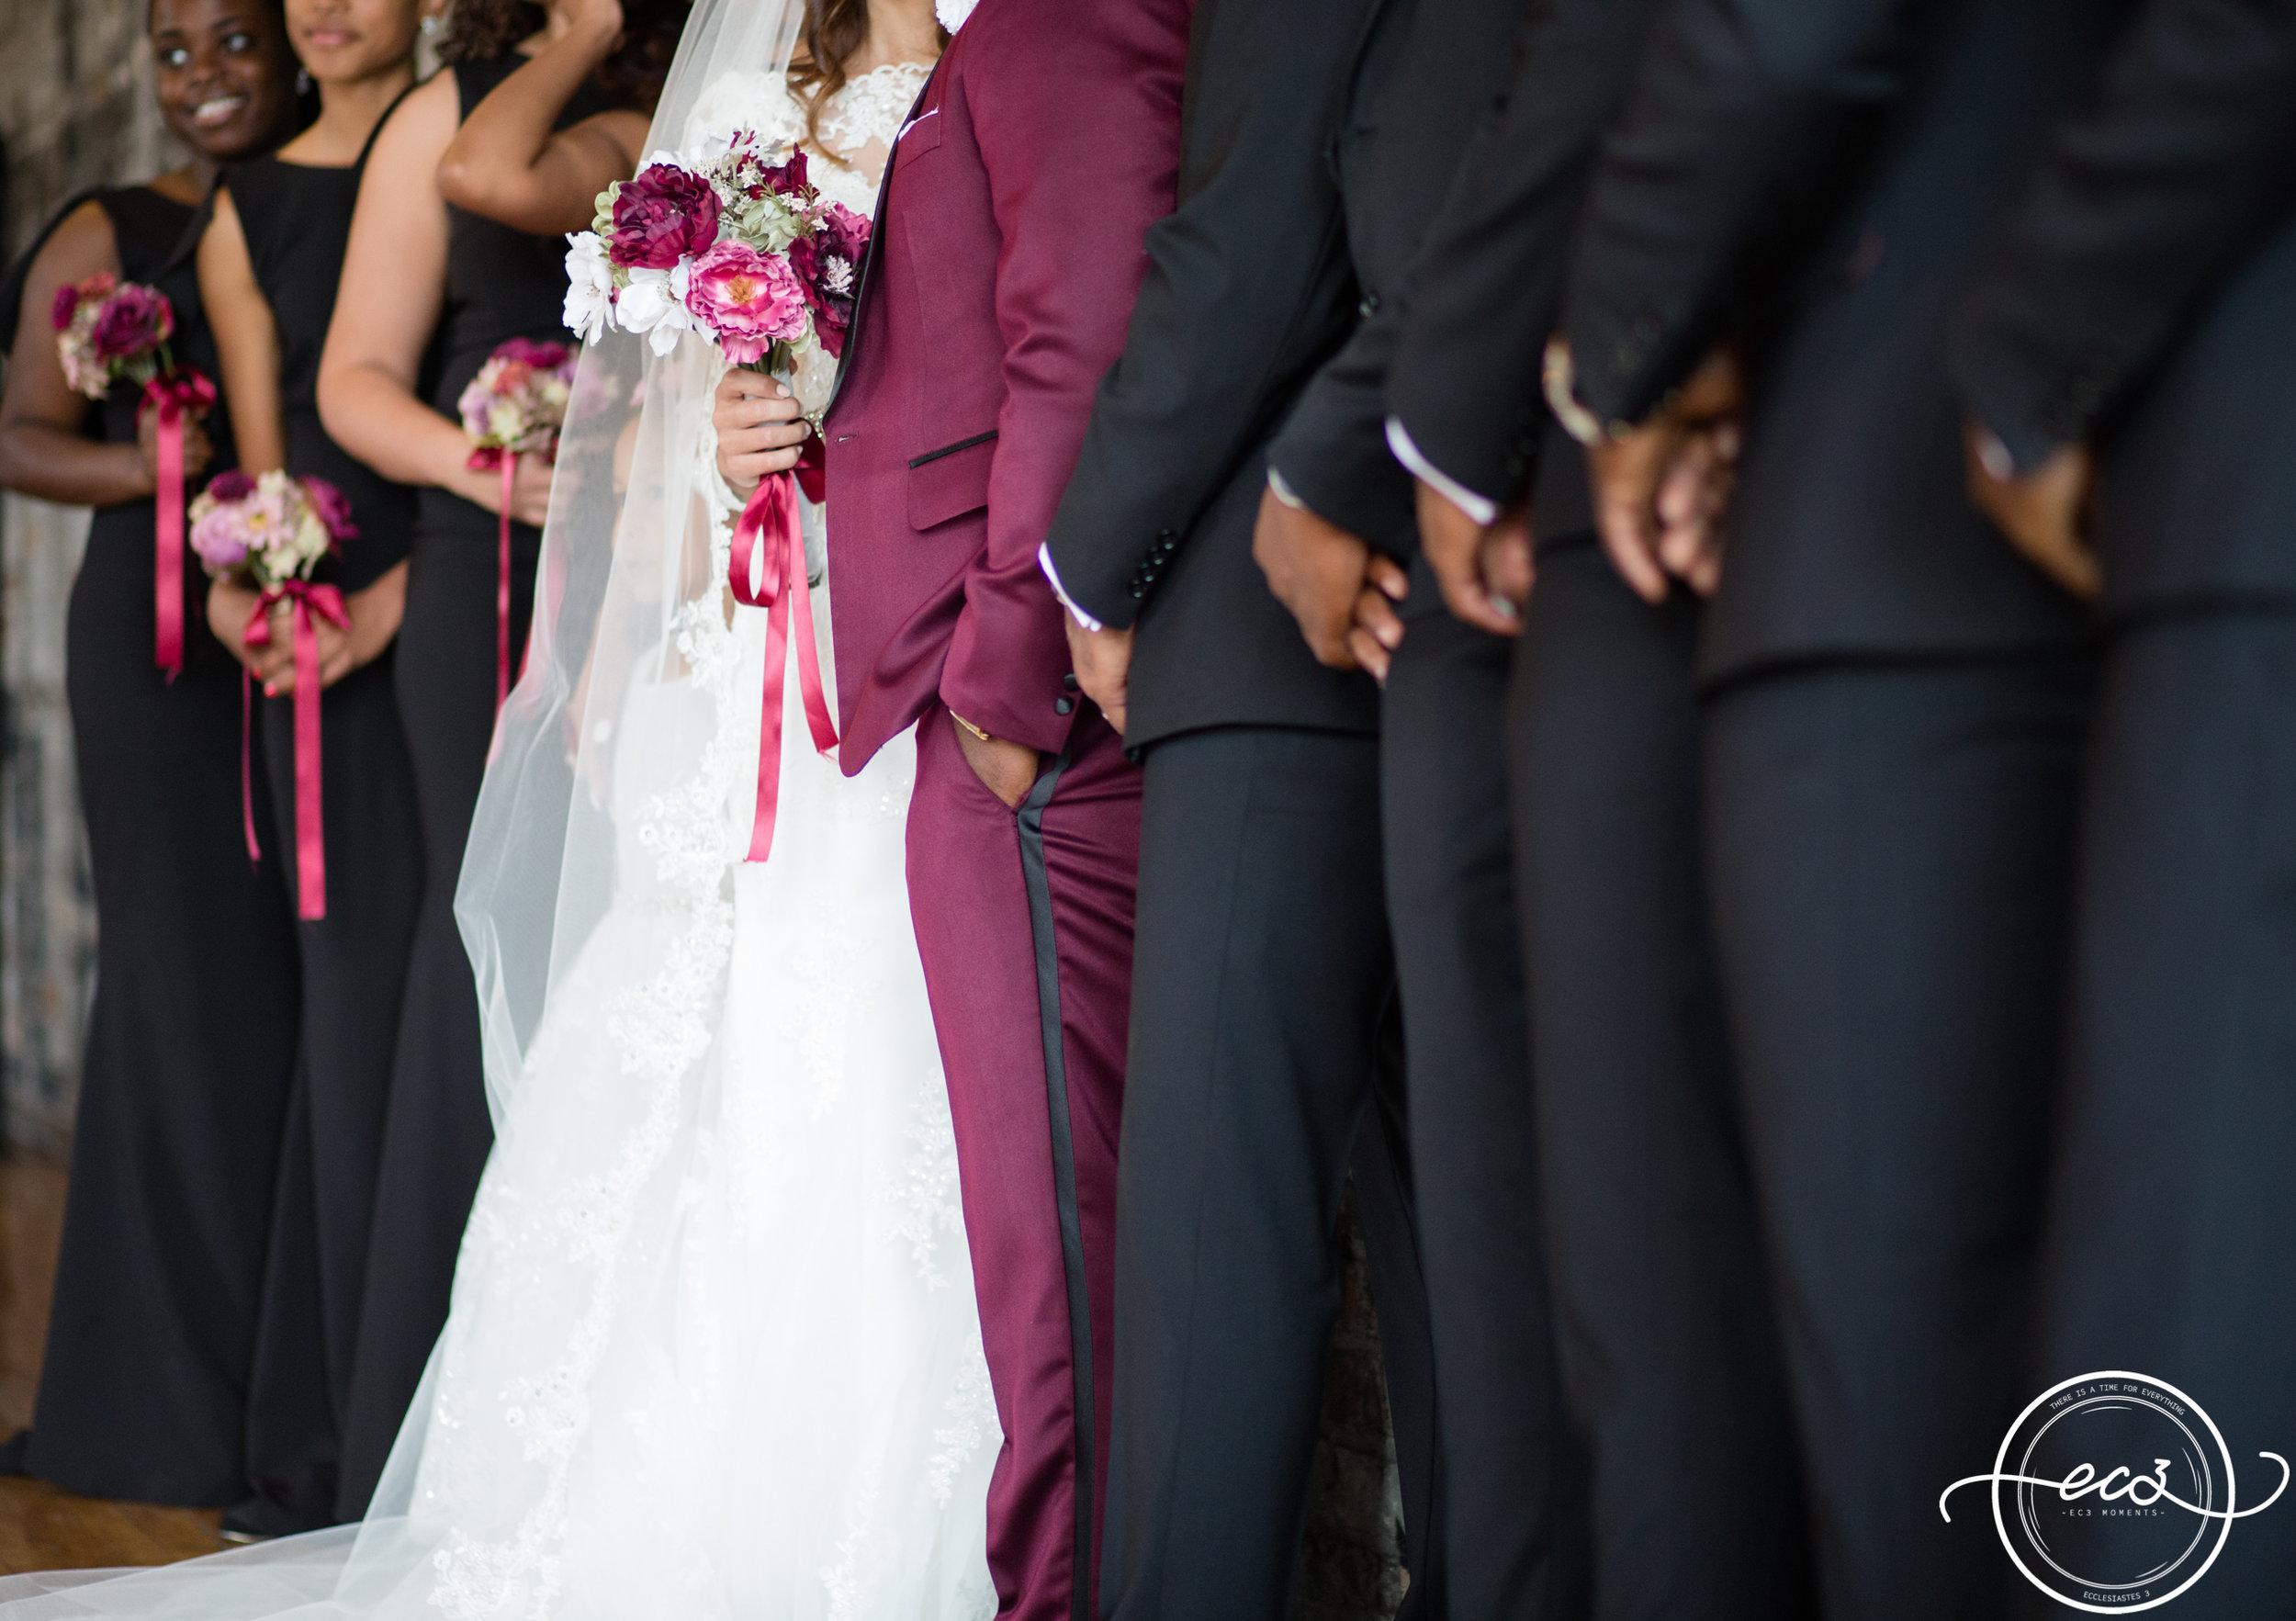 AA-Rustic-Toronto-Burroughes-Wedding30.jpg